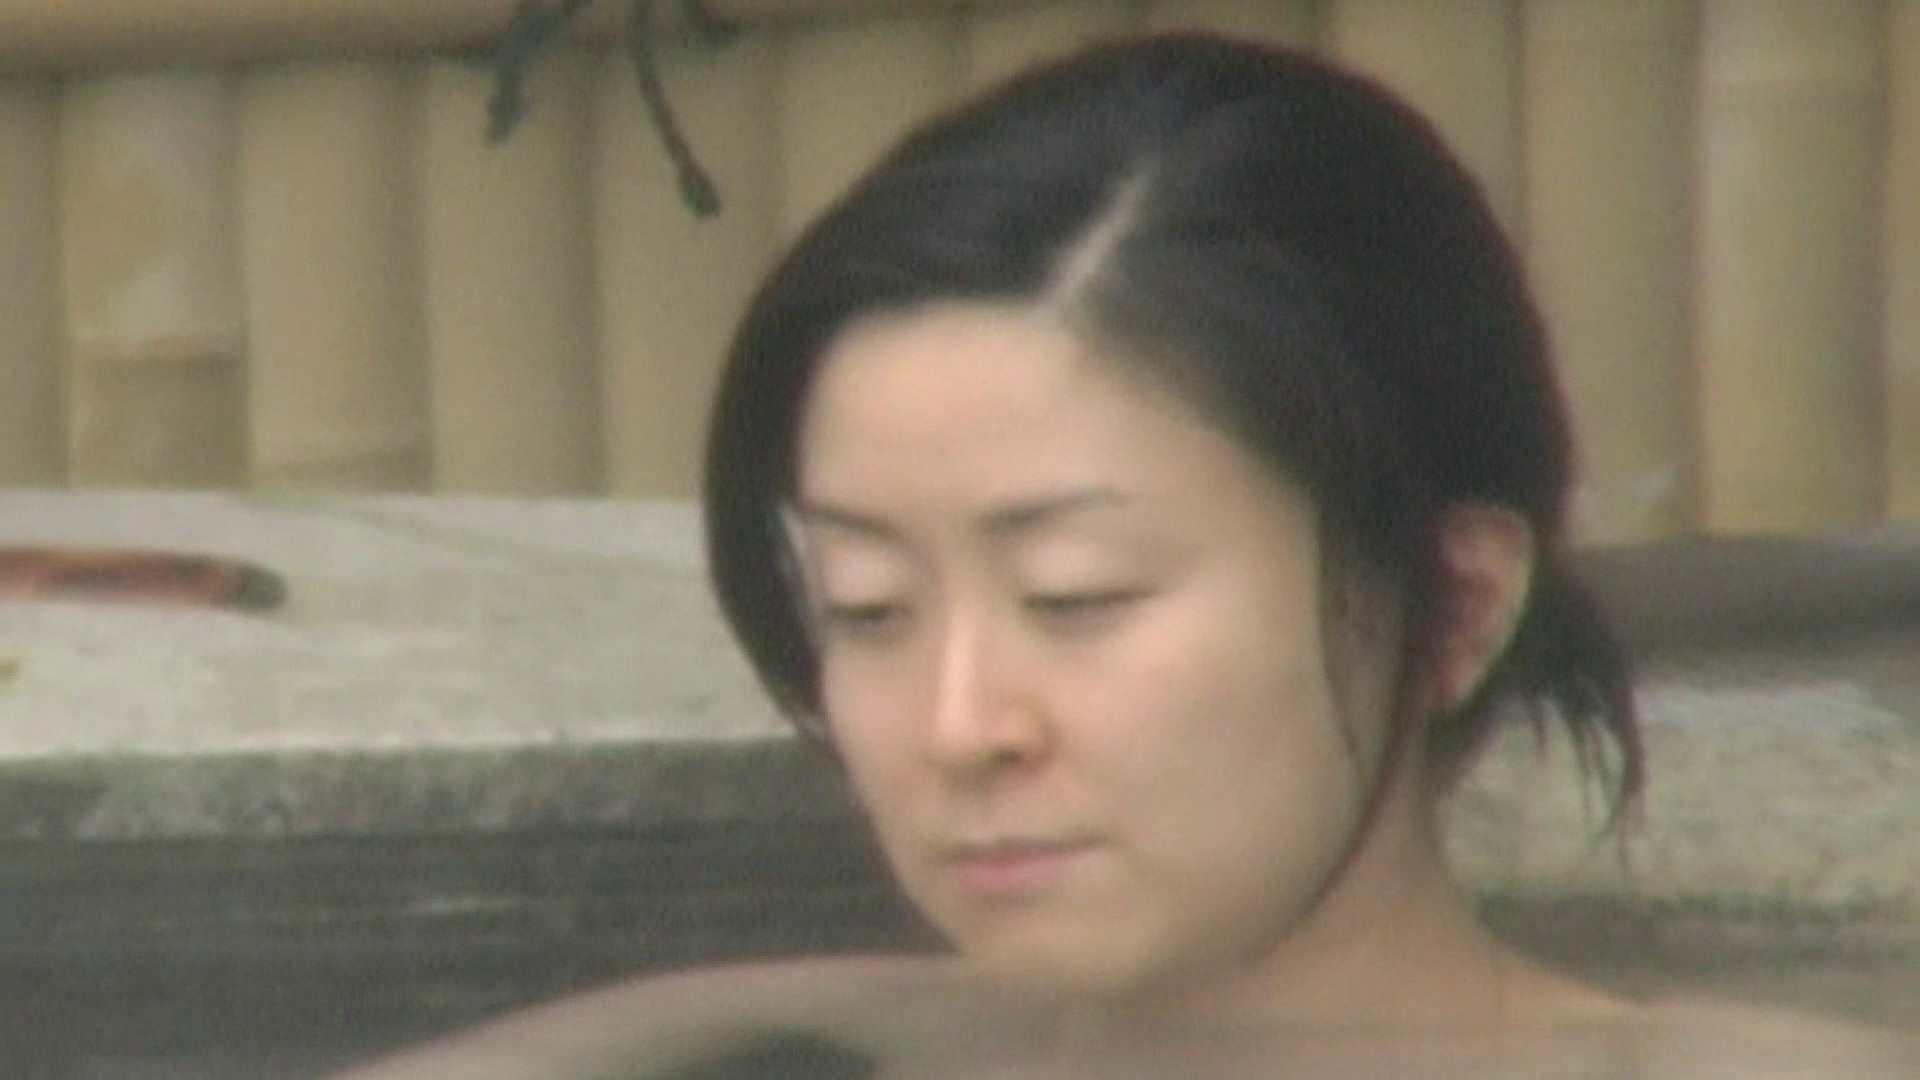 Aquaな露天風呂Vol.548 盗撮  97連発 43